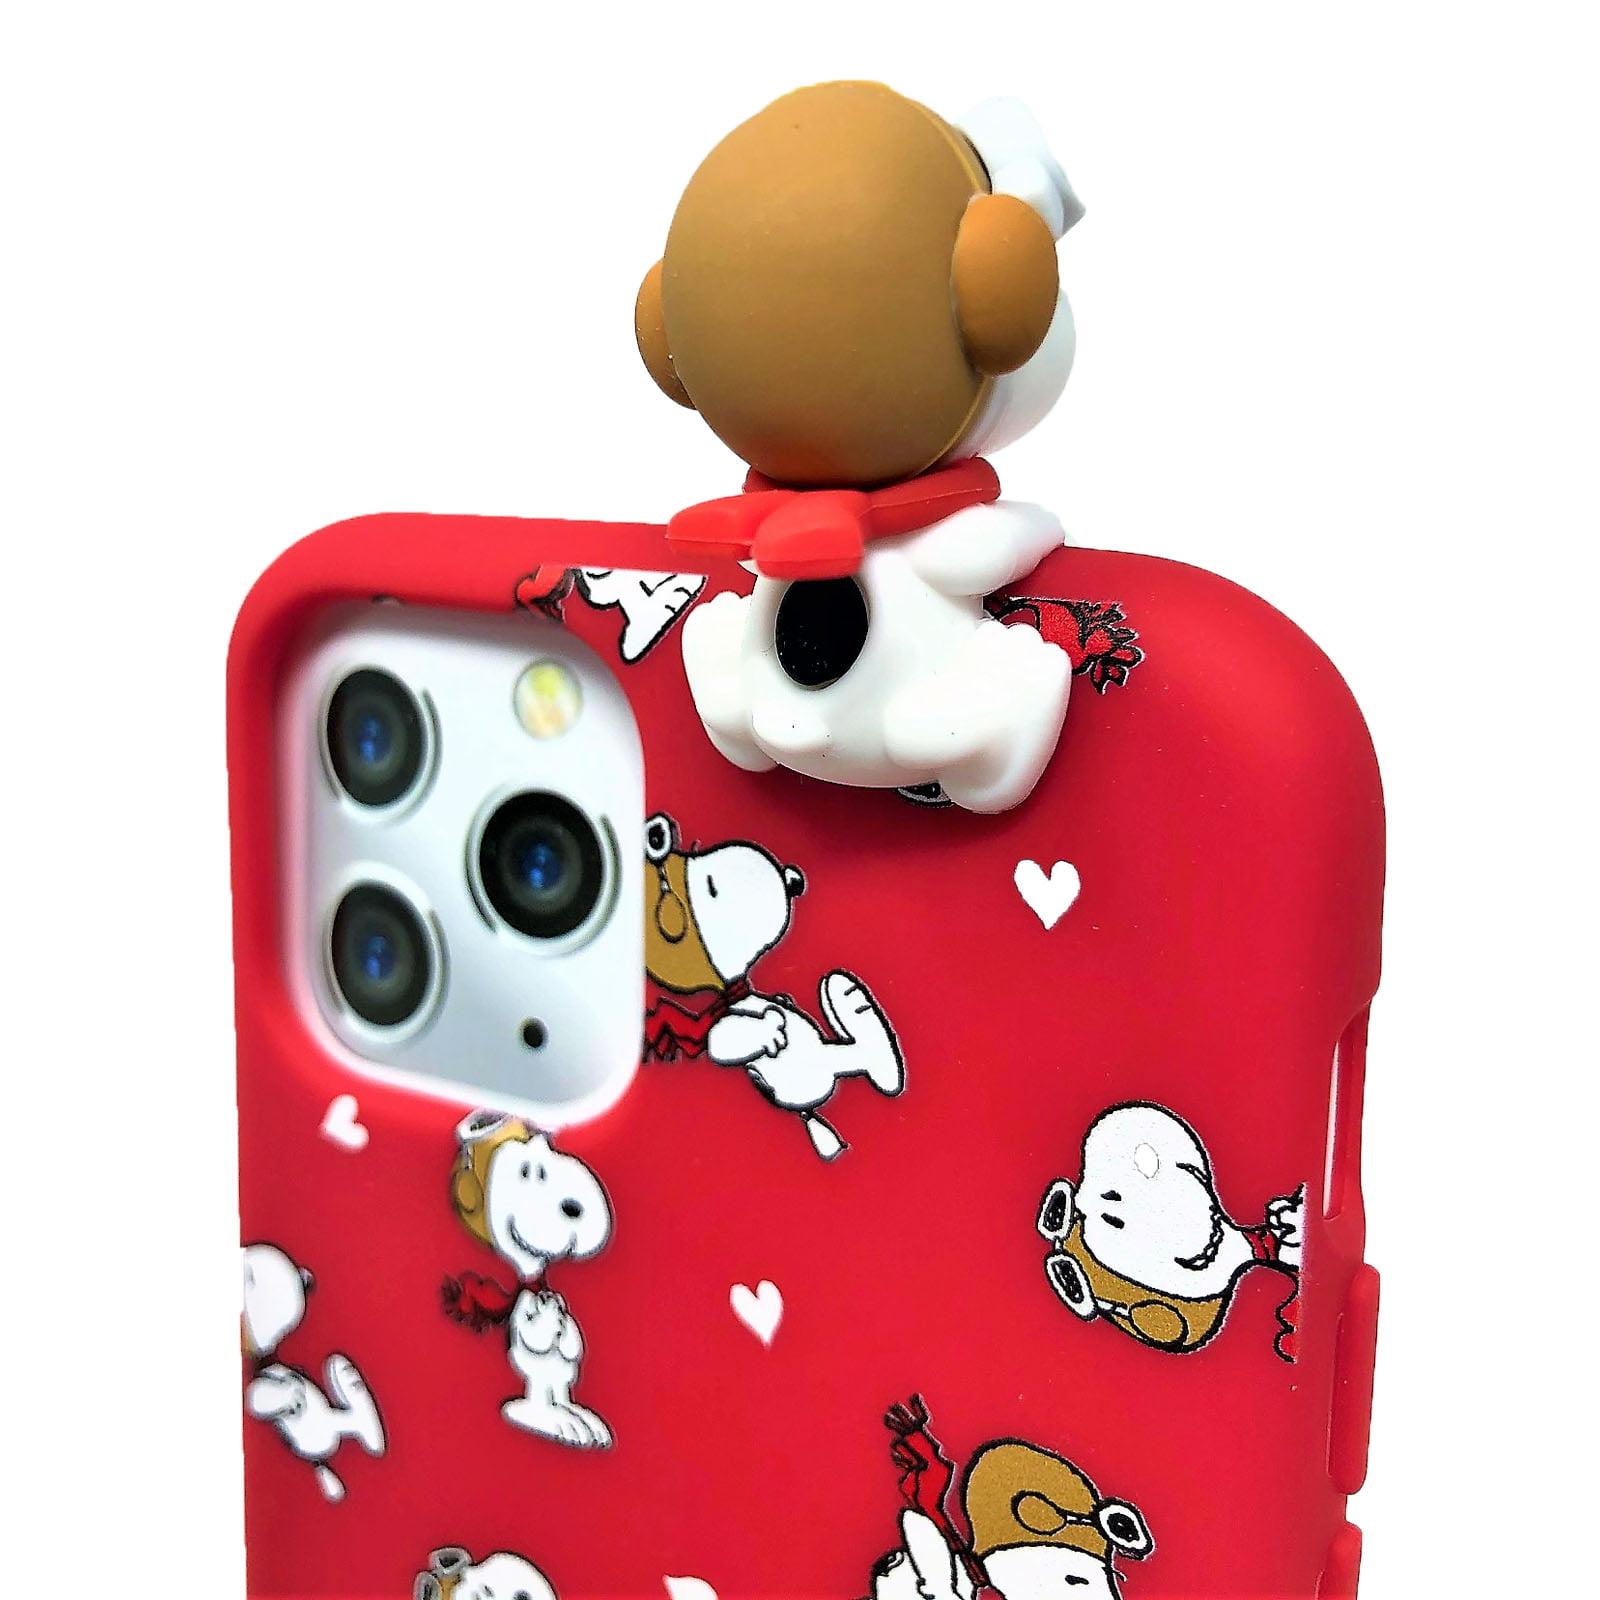 "Peanuts 3"" Farmer Snoopy With Wheelbarrow Rubber Toy"